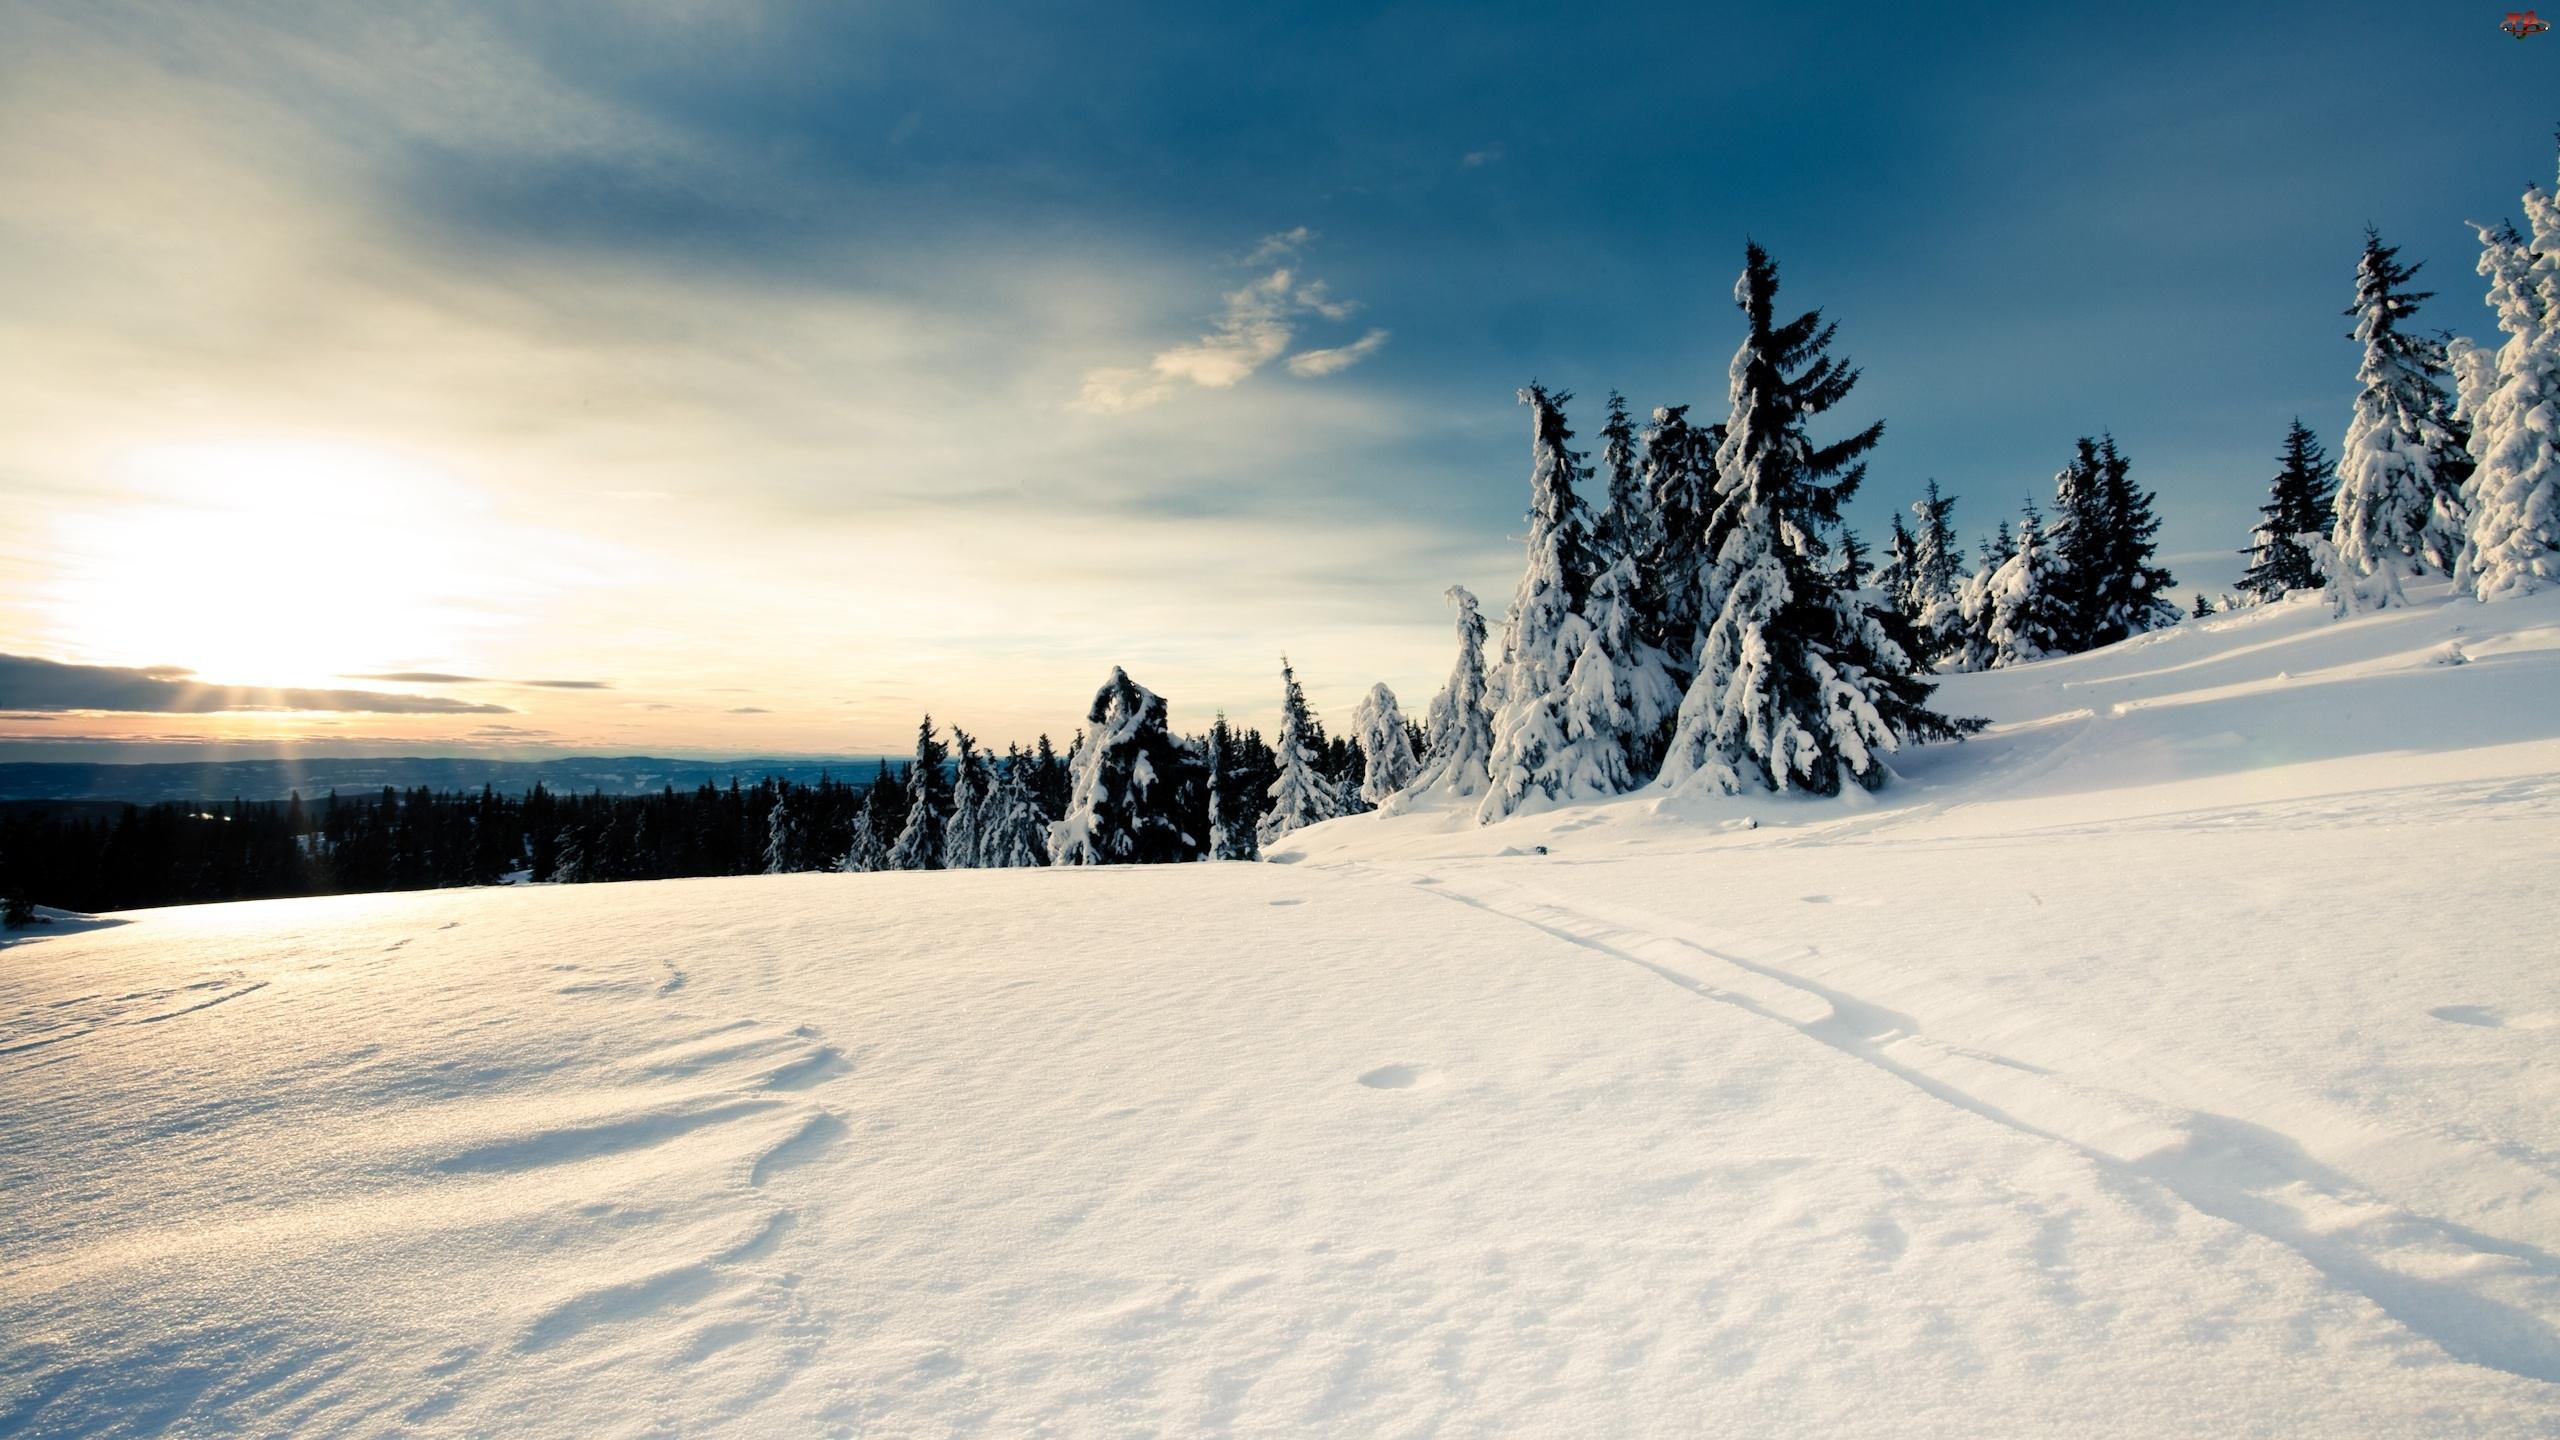 Śnieg, Mróz, Zaspy, Las